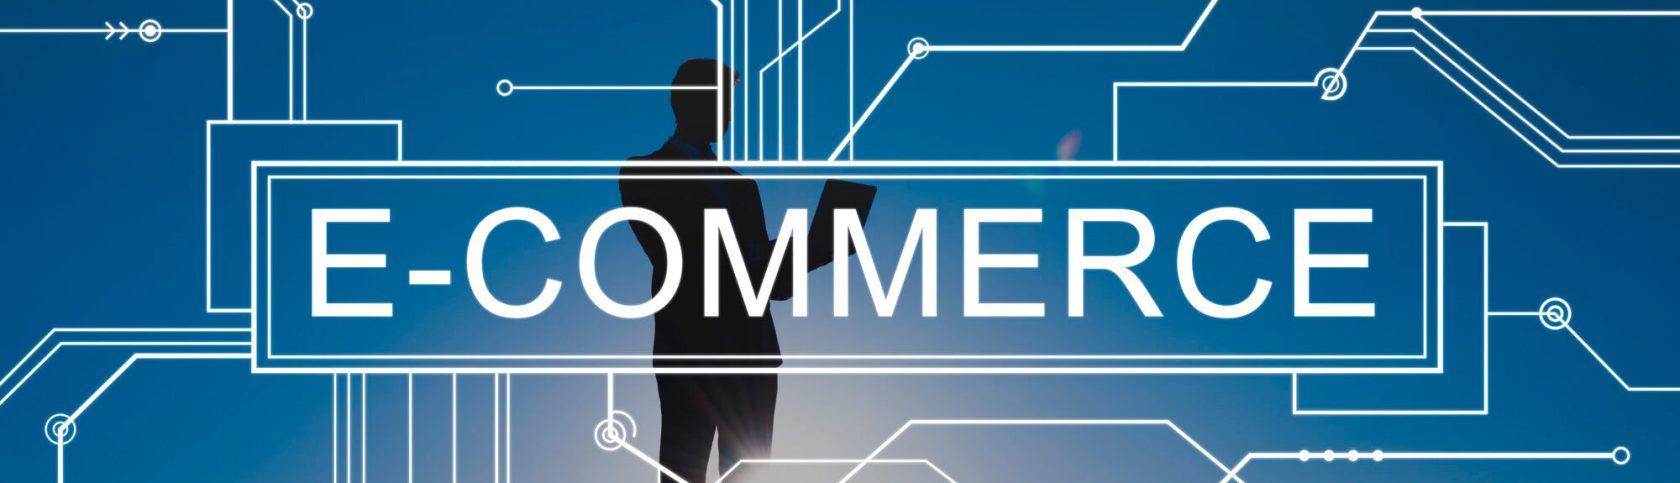 eCommerce website design Ajman